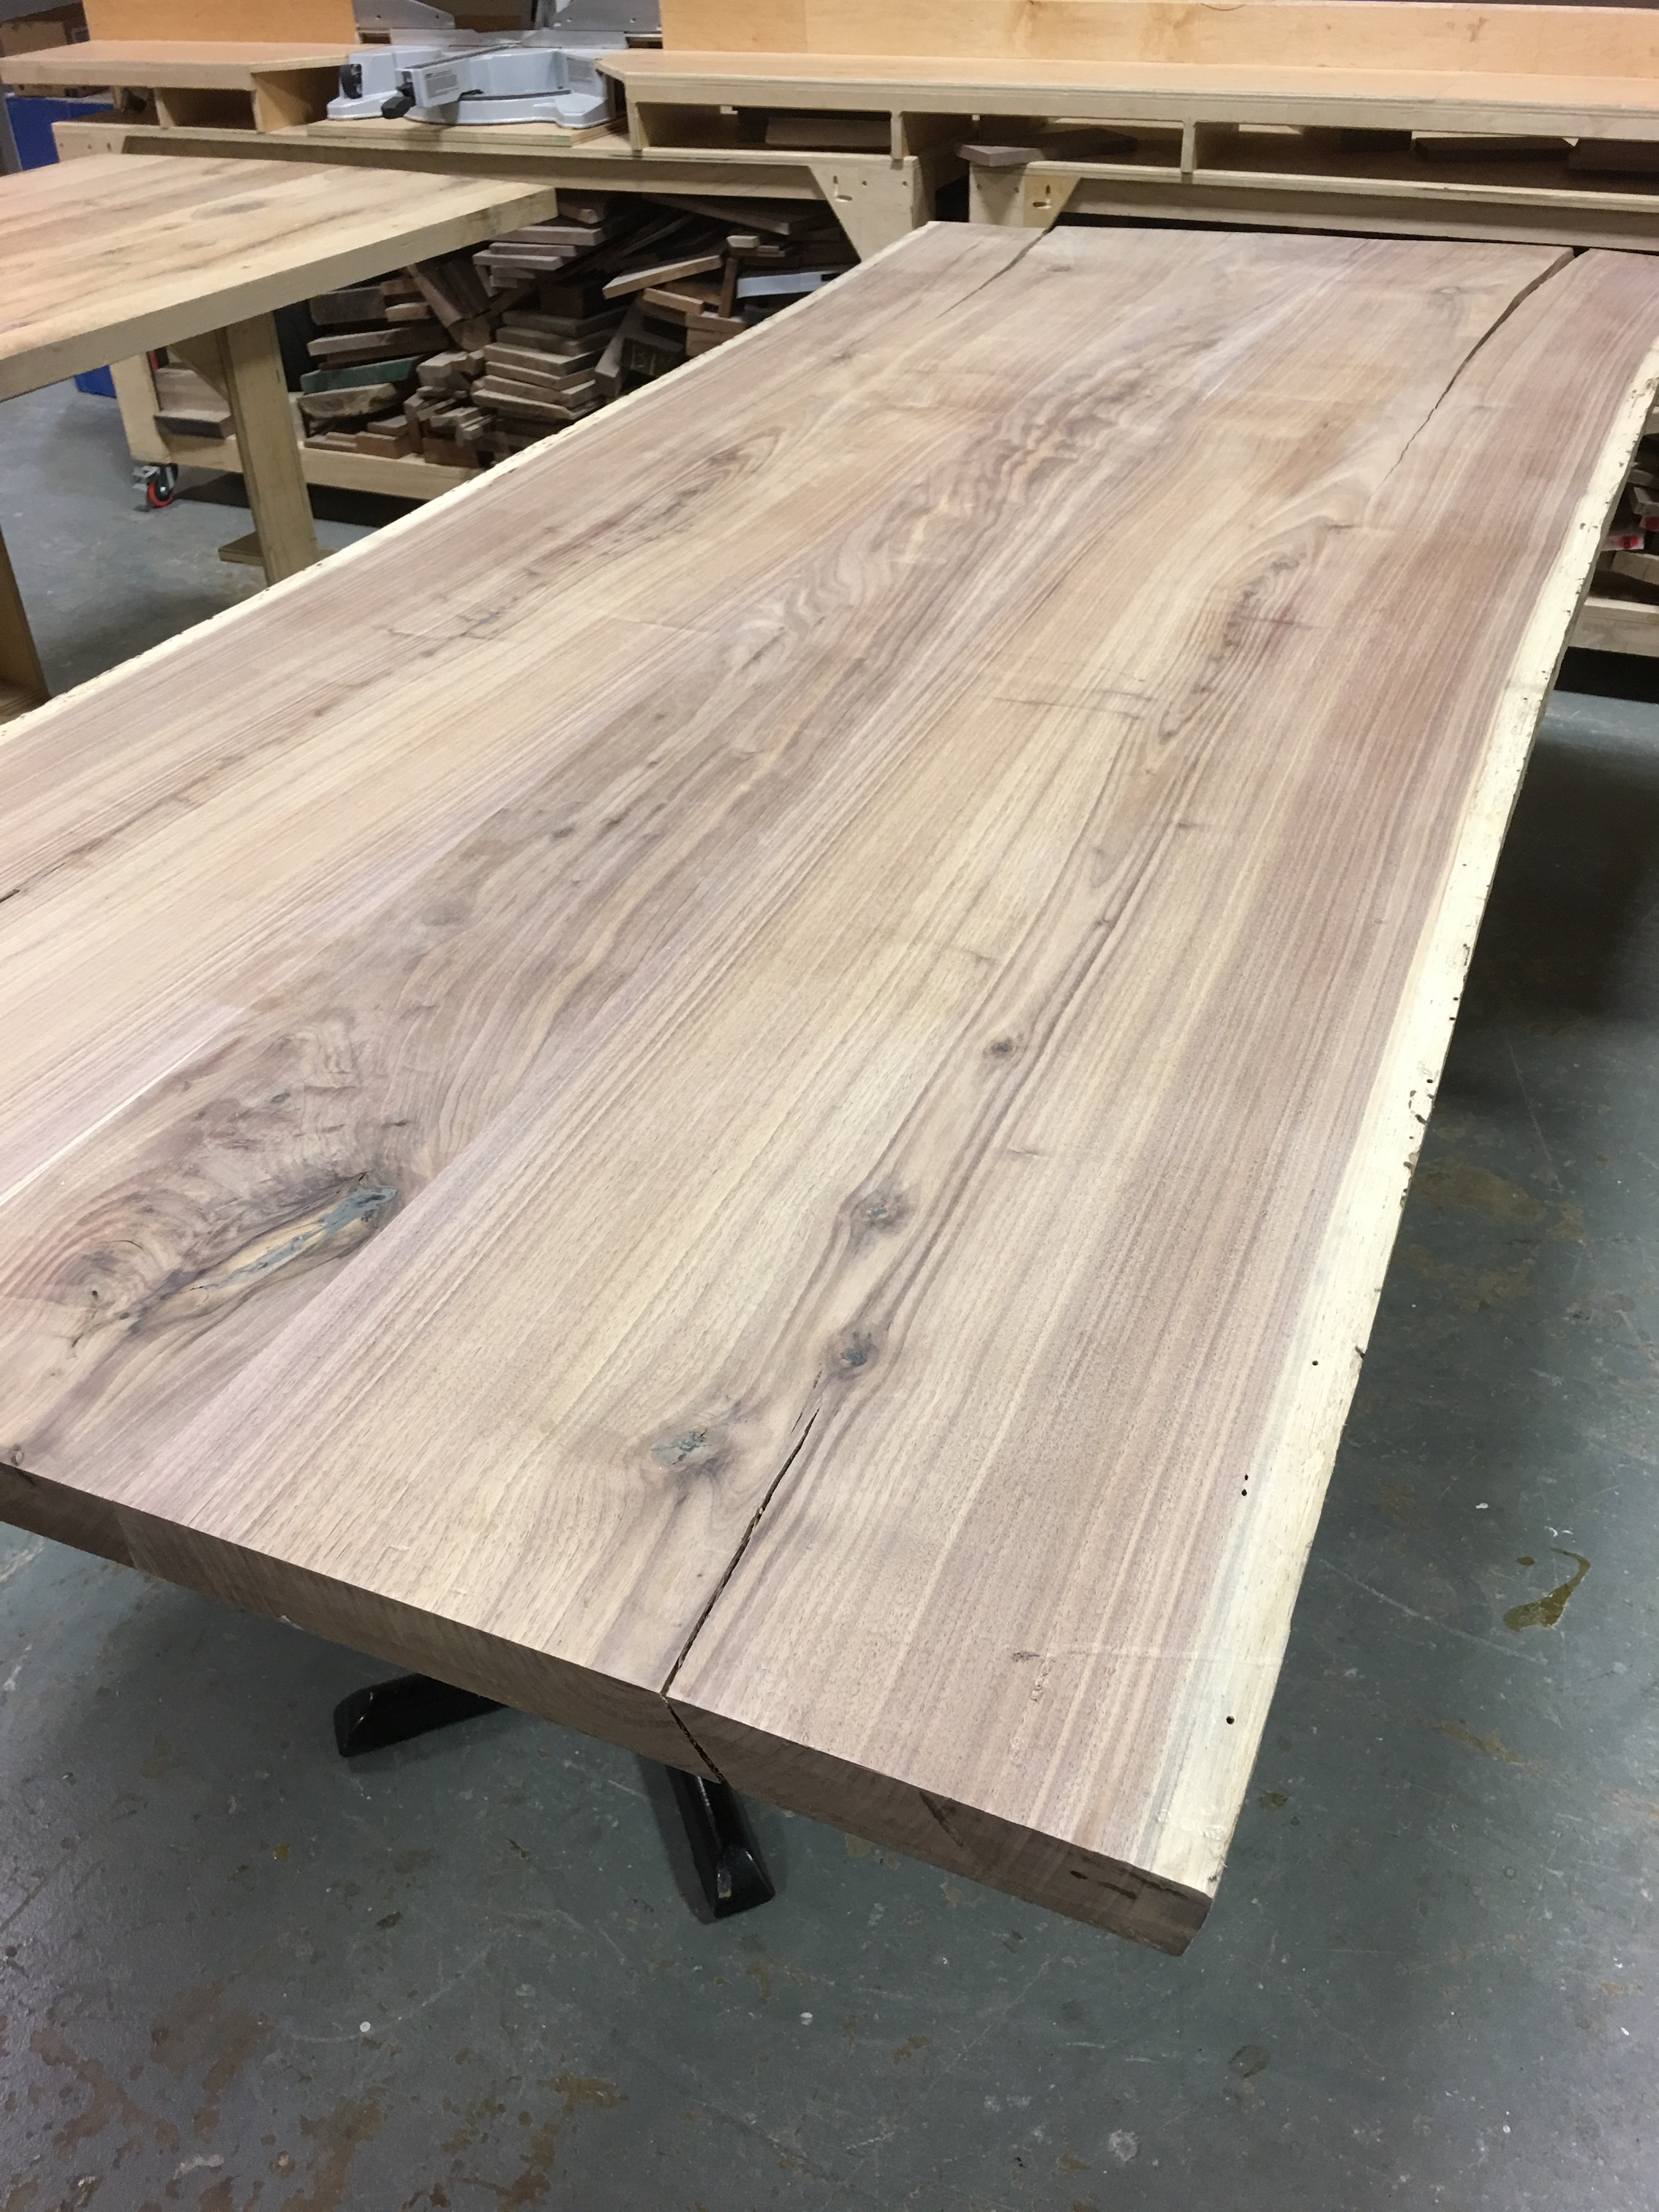 Reclaimed Live Edge Walnut Table Top